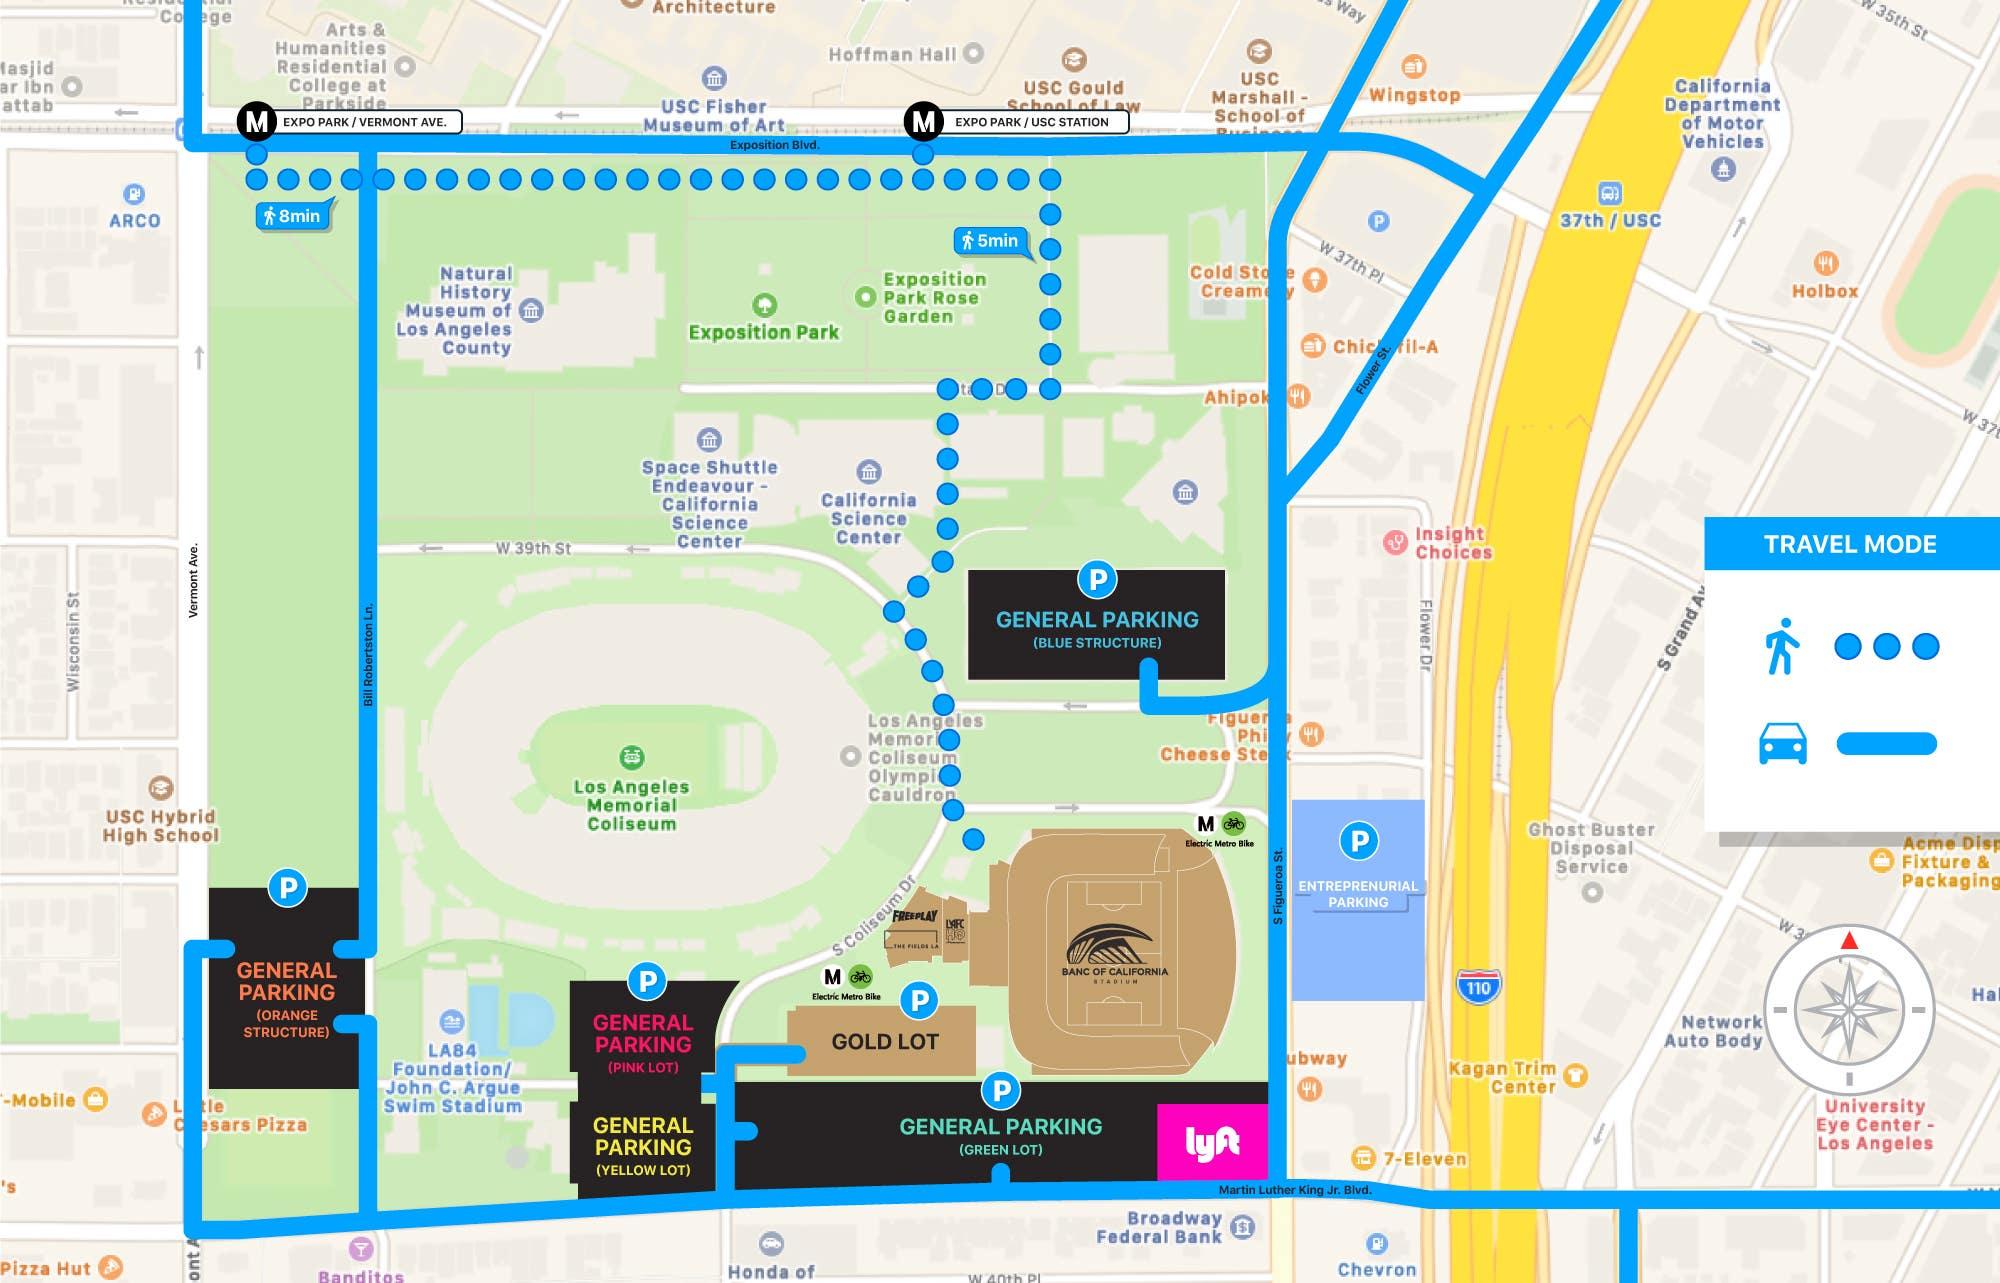 Banc of California Stadium parking map